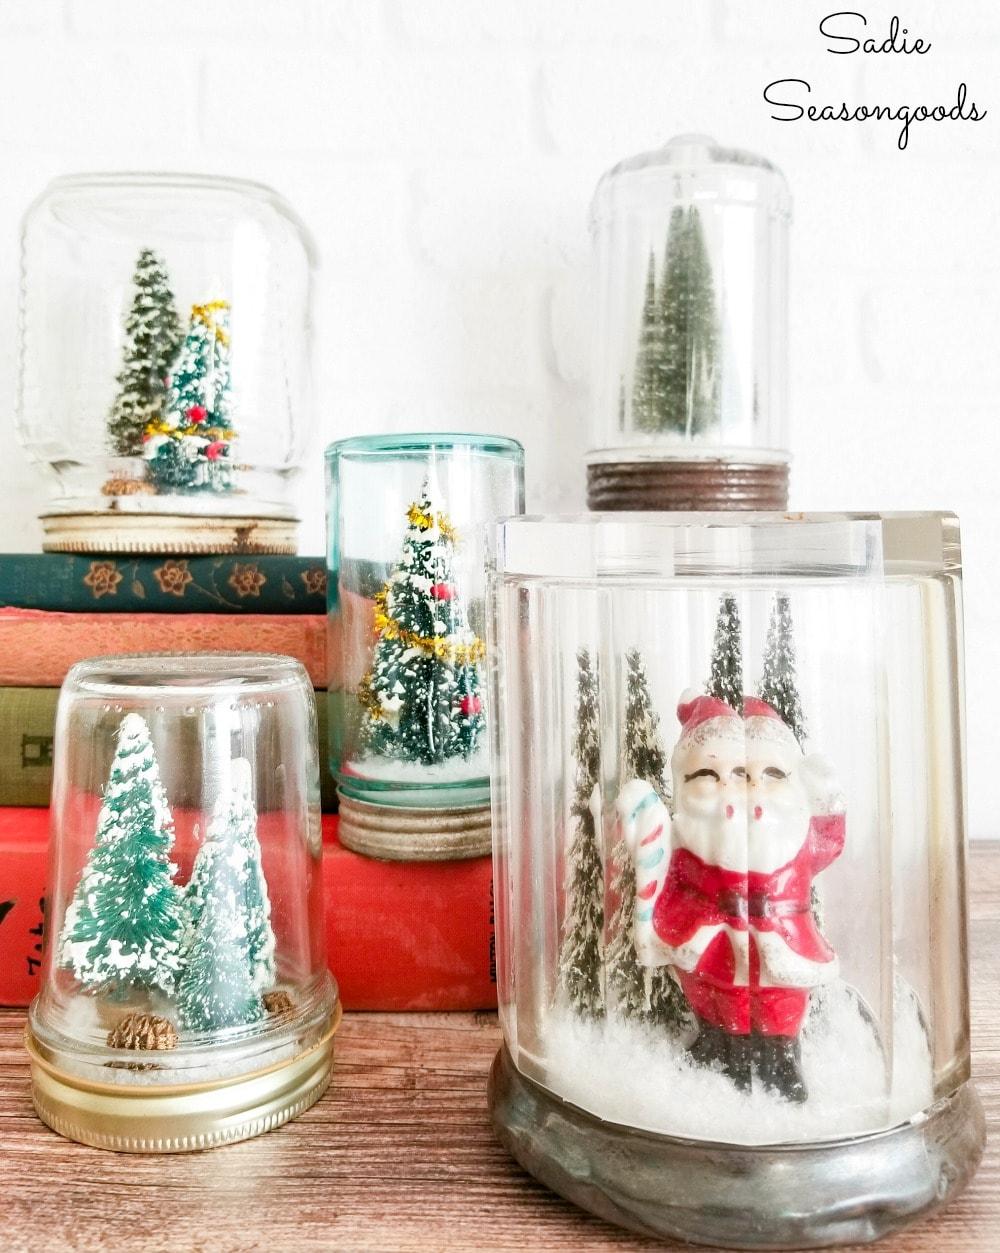 DIY waterless snow globe with vintage Christmas decorations